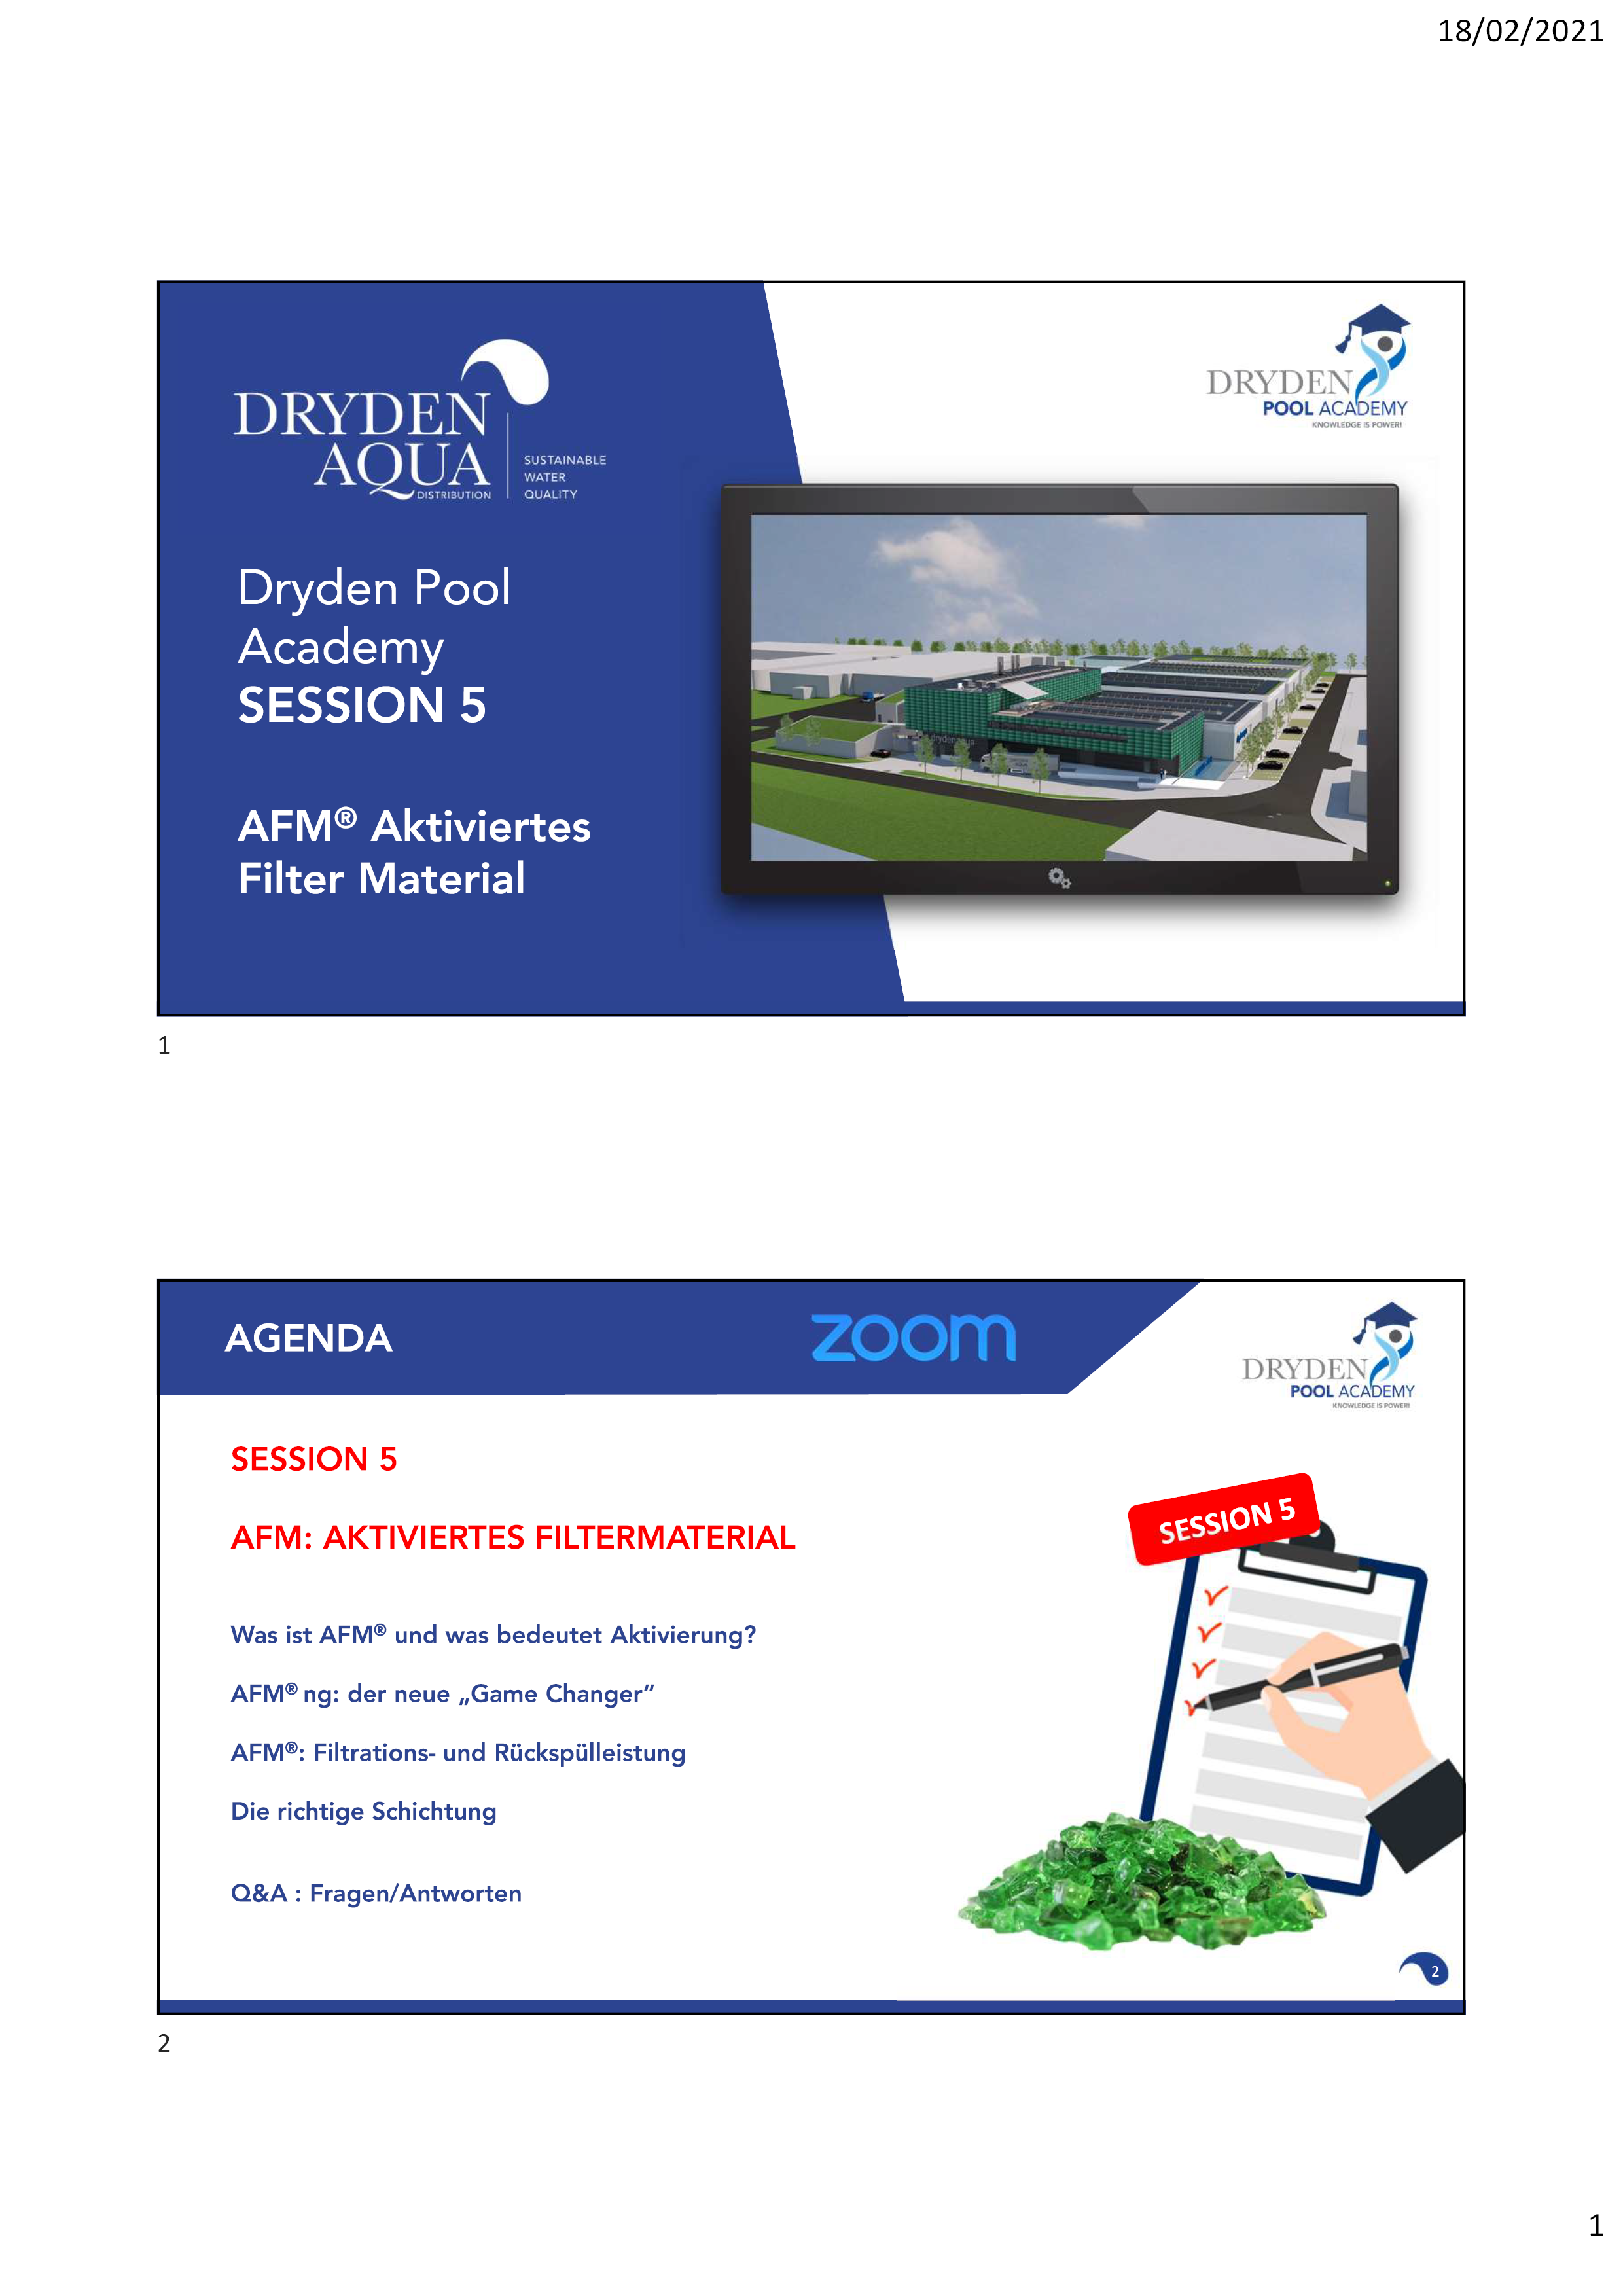 SESSION 5 - Presentation DE